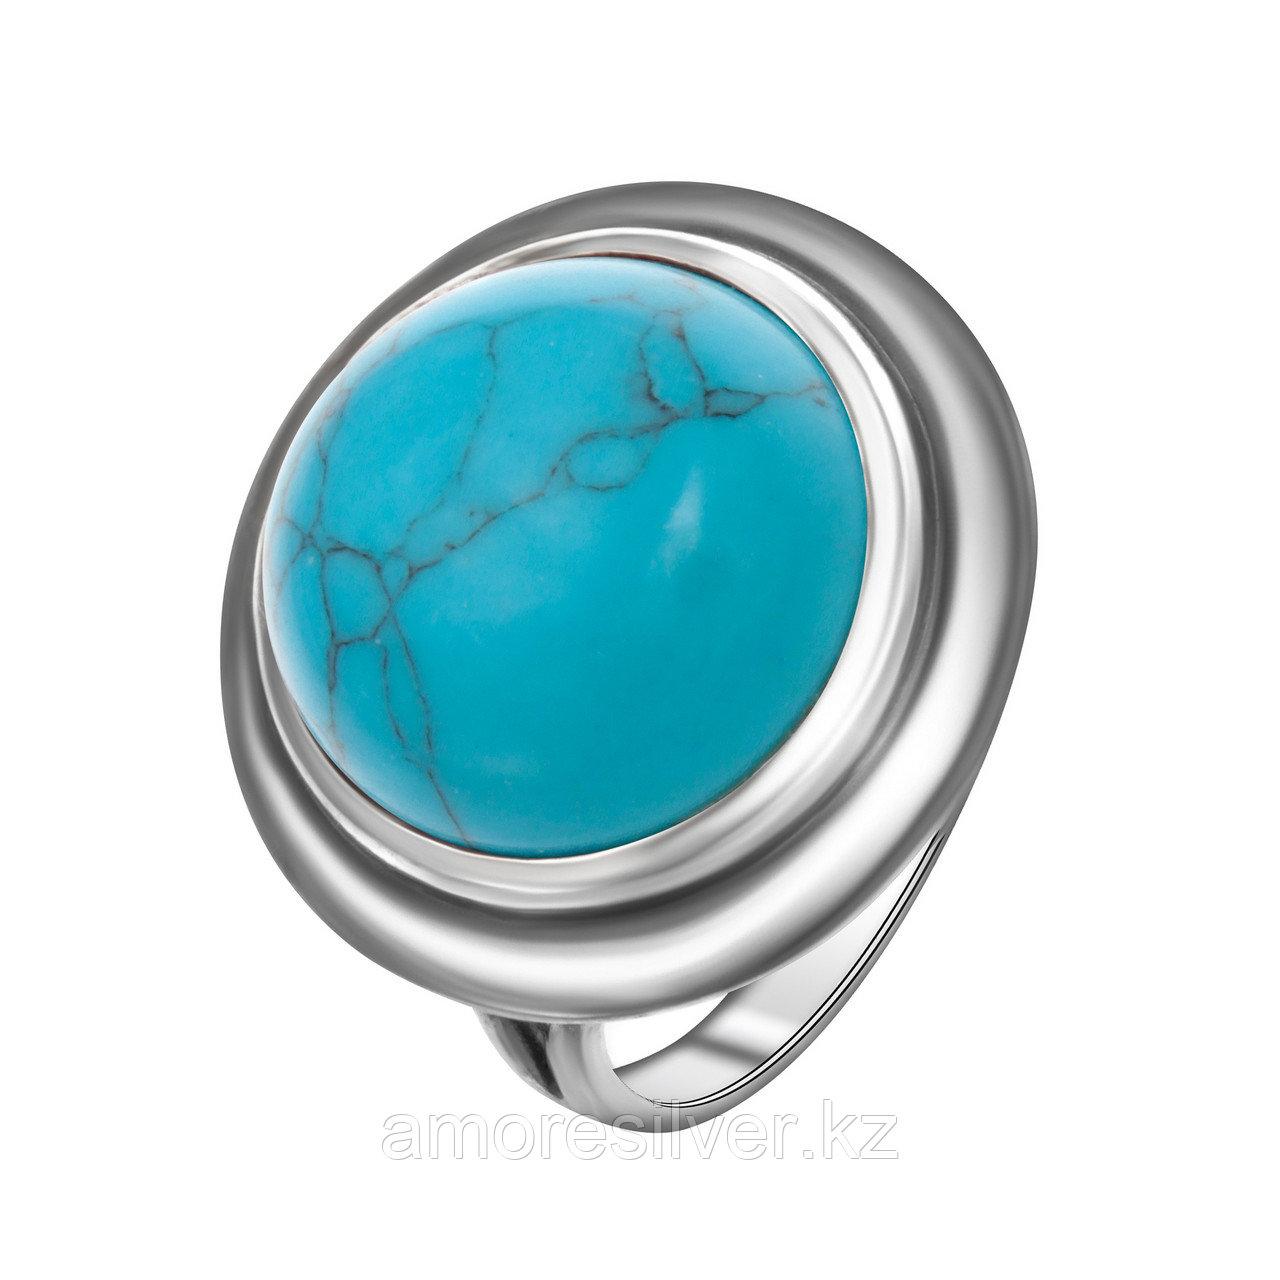 Кольцо Приволжский Ювелир , коралл синт. 233240